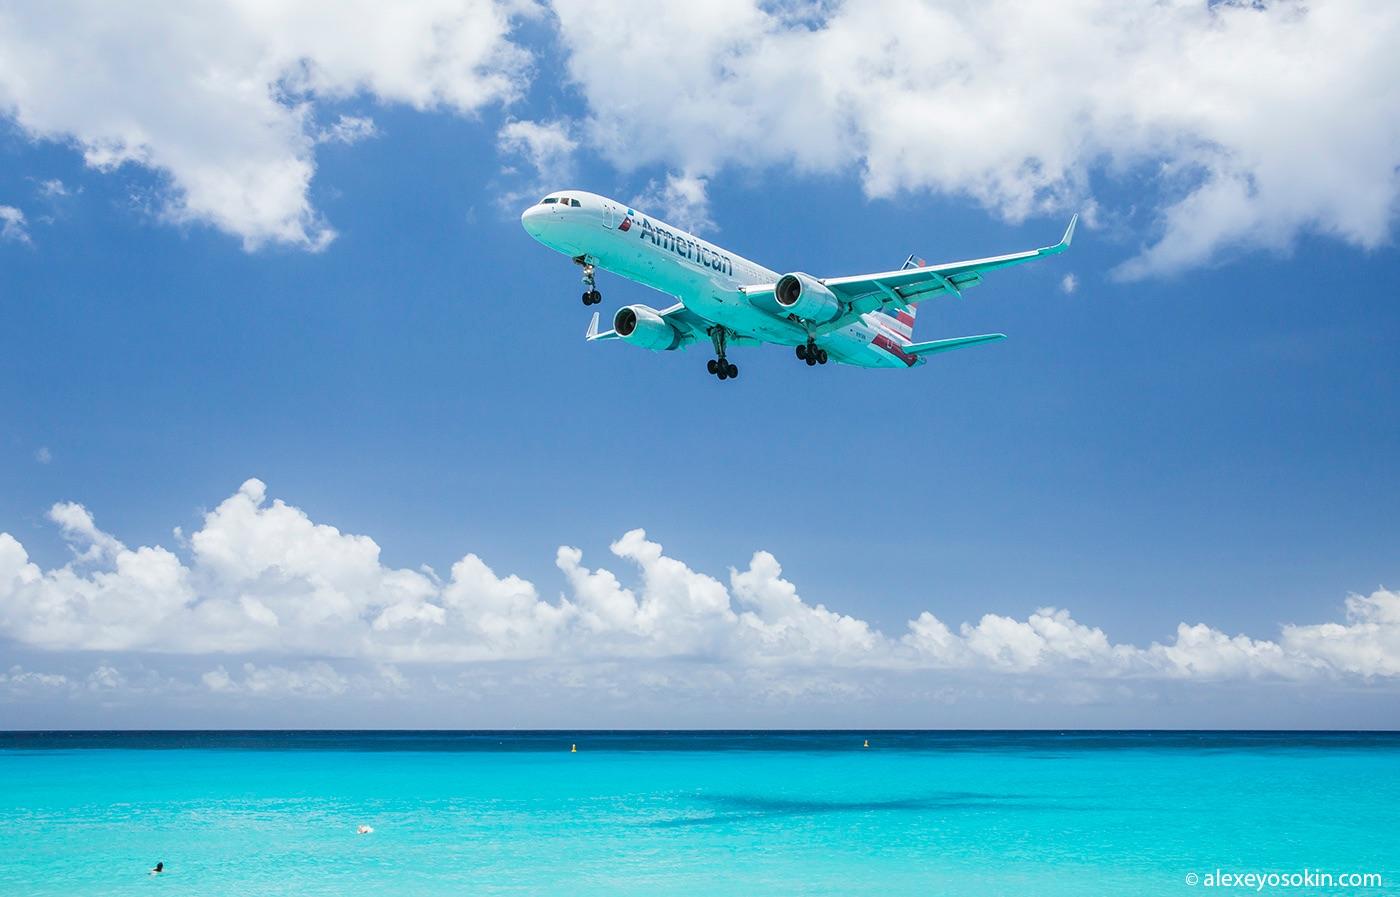 st_martin_airplane_AO_1010.JPG